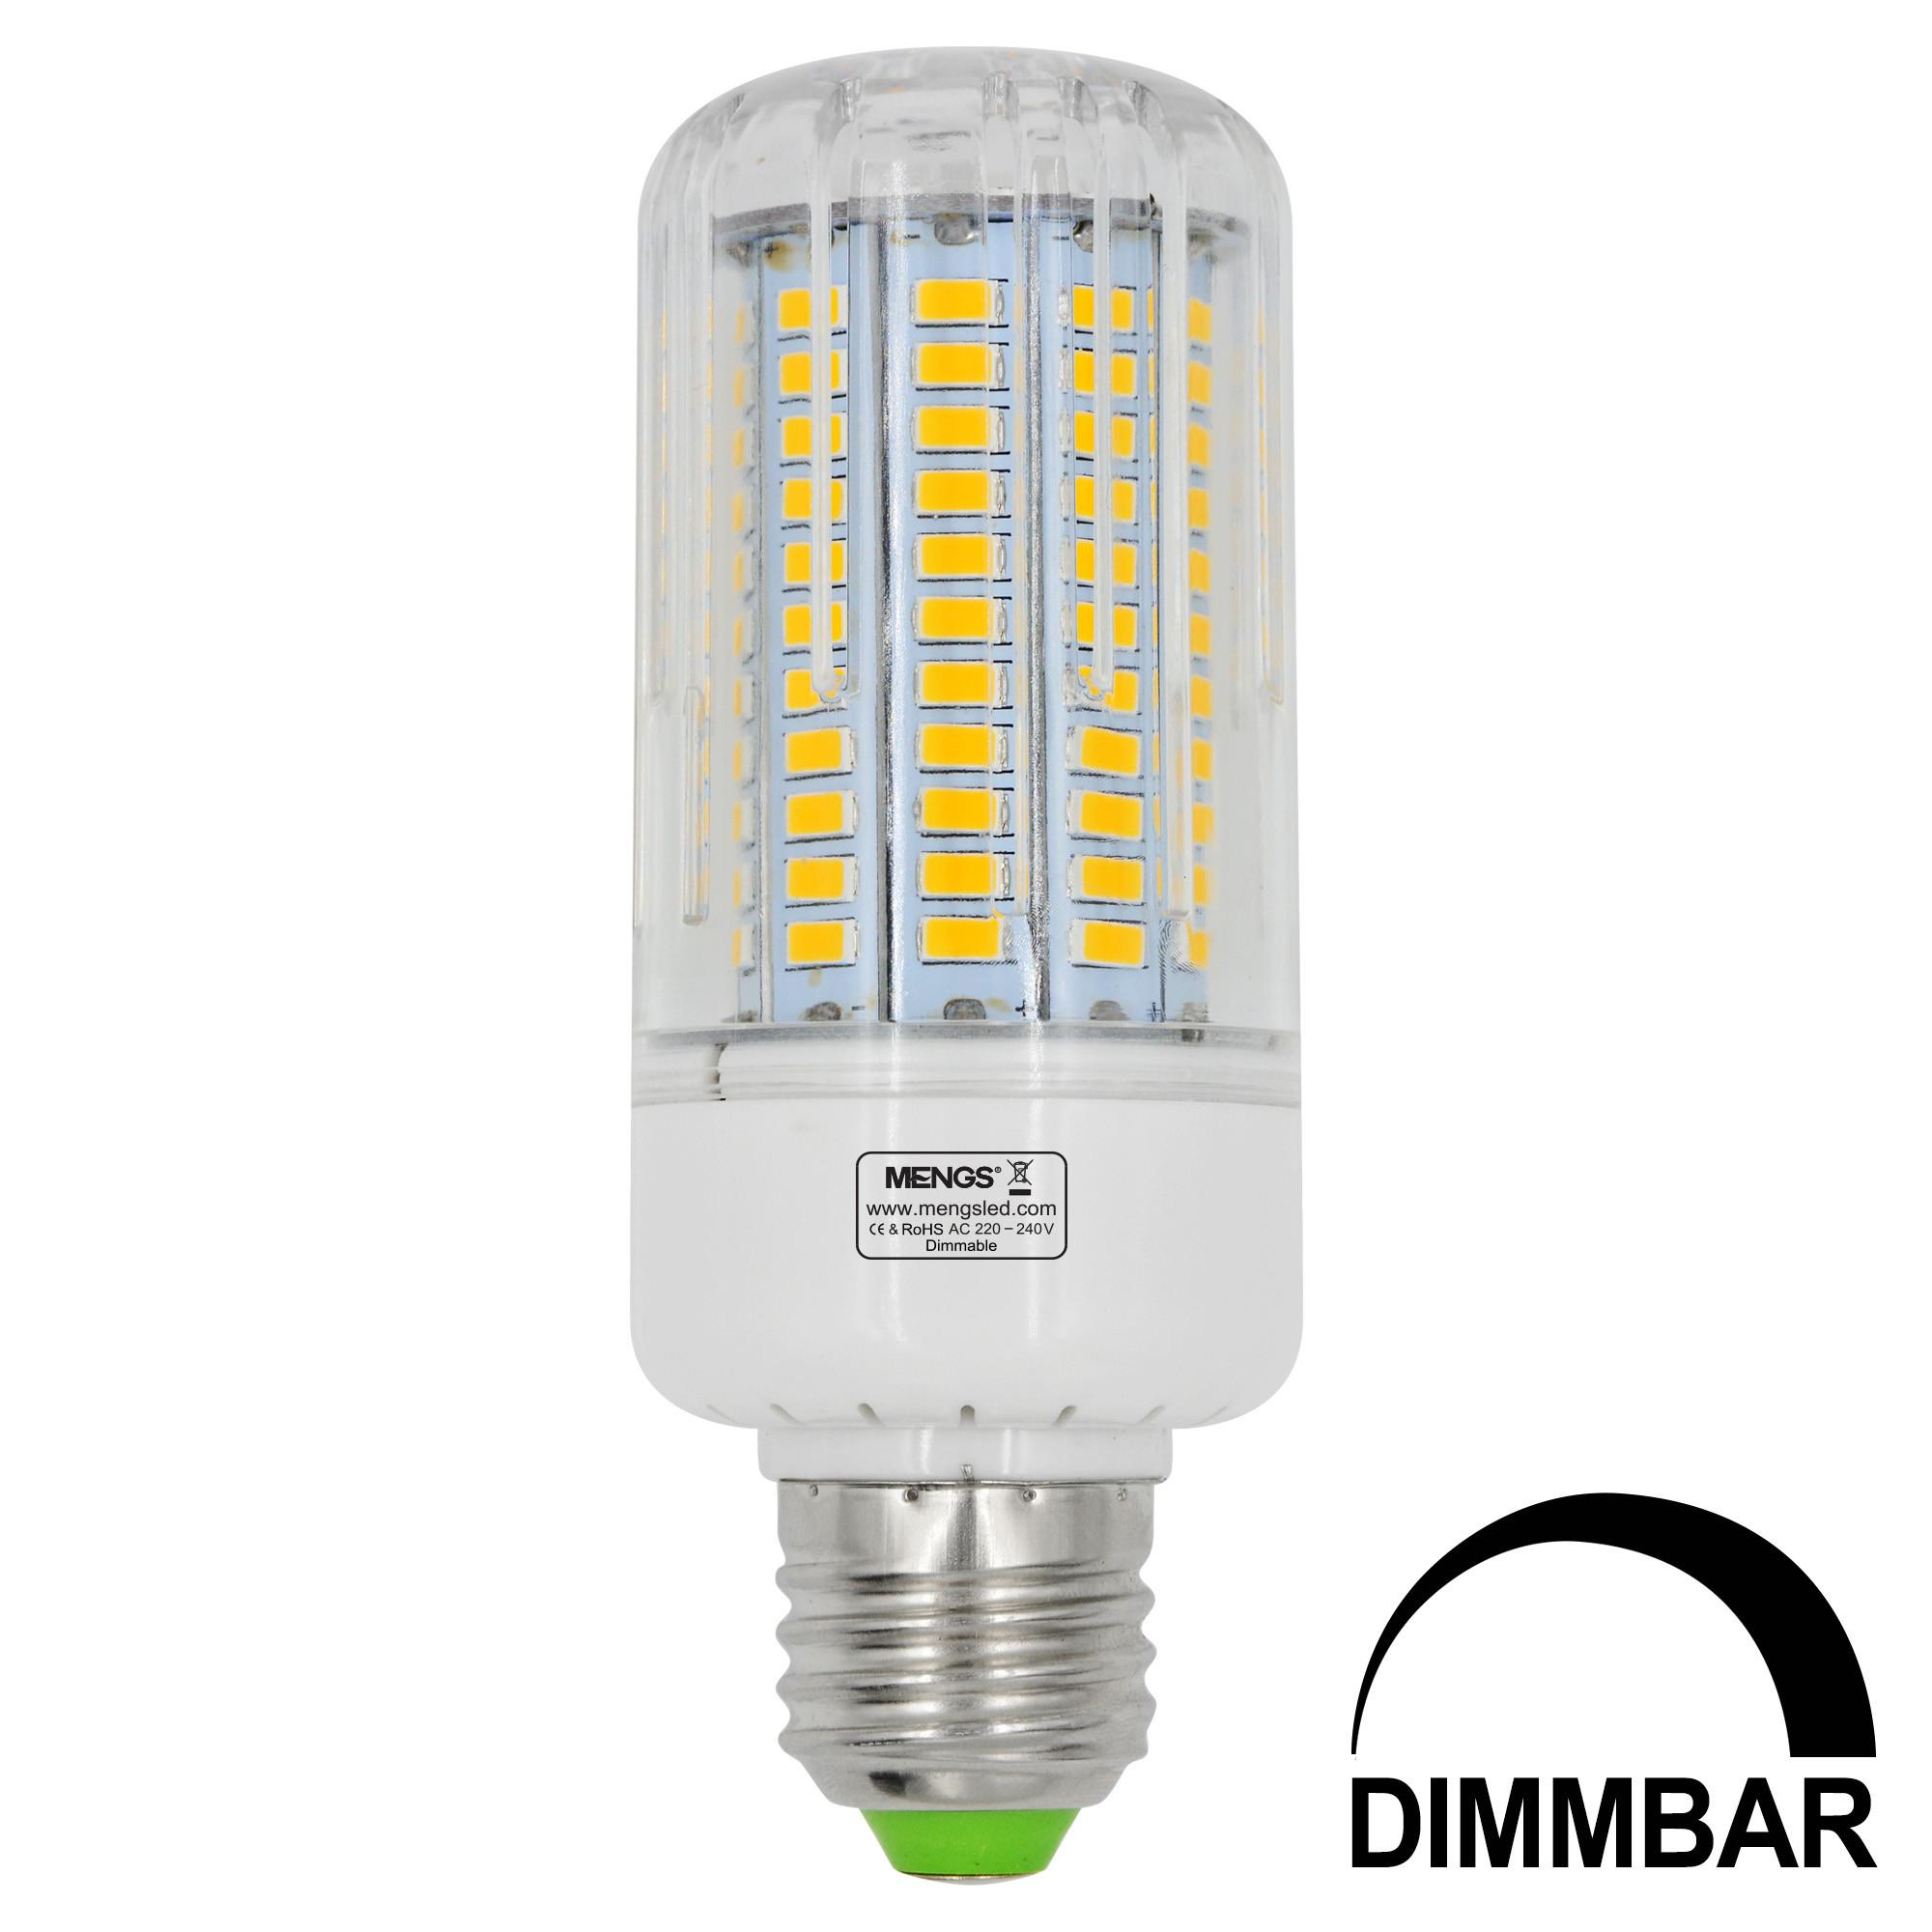 MENGS® E27 18W LED Dimmable Corn Light 130x 5736 SMD LED Bulb Lamp AC 220-240V In Warm White Energy-Saving Light